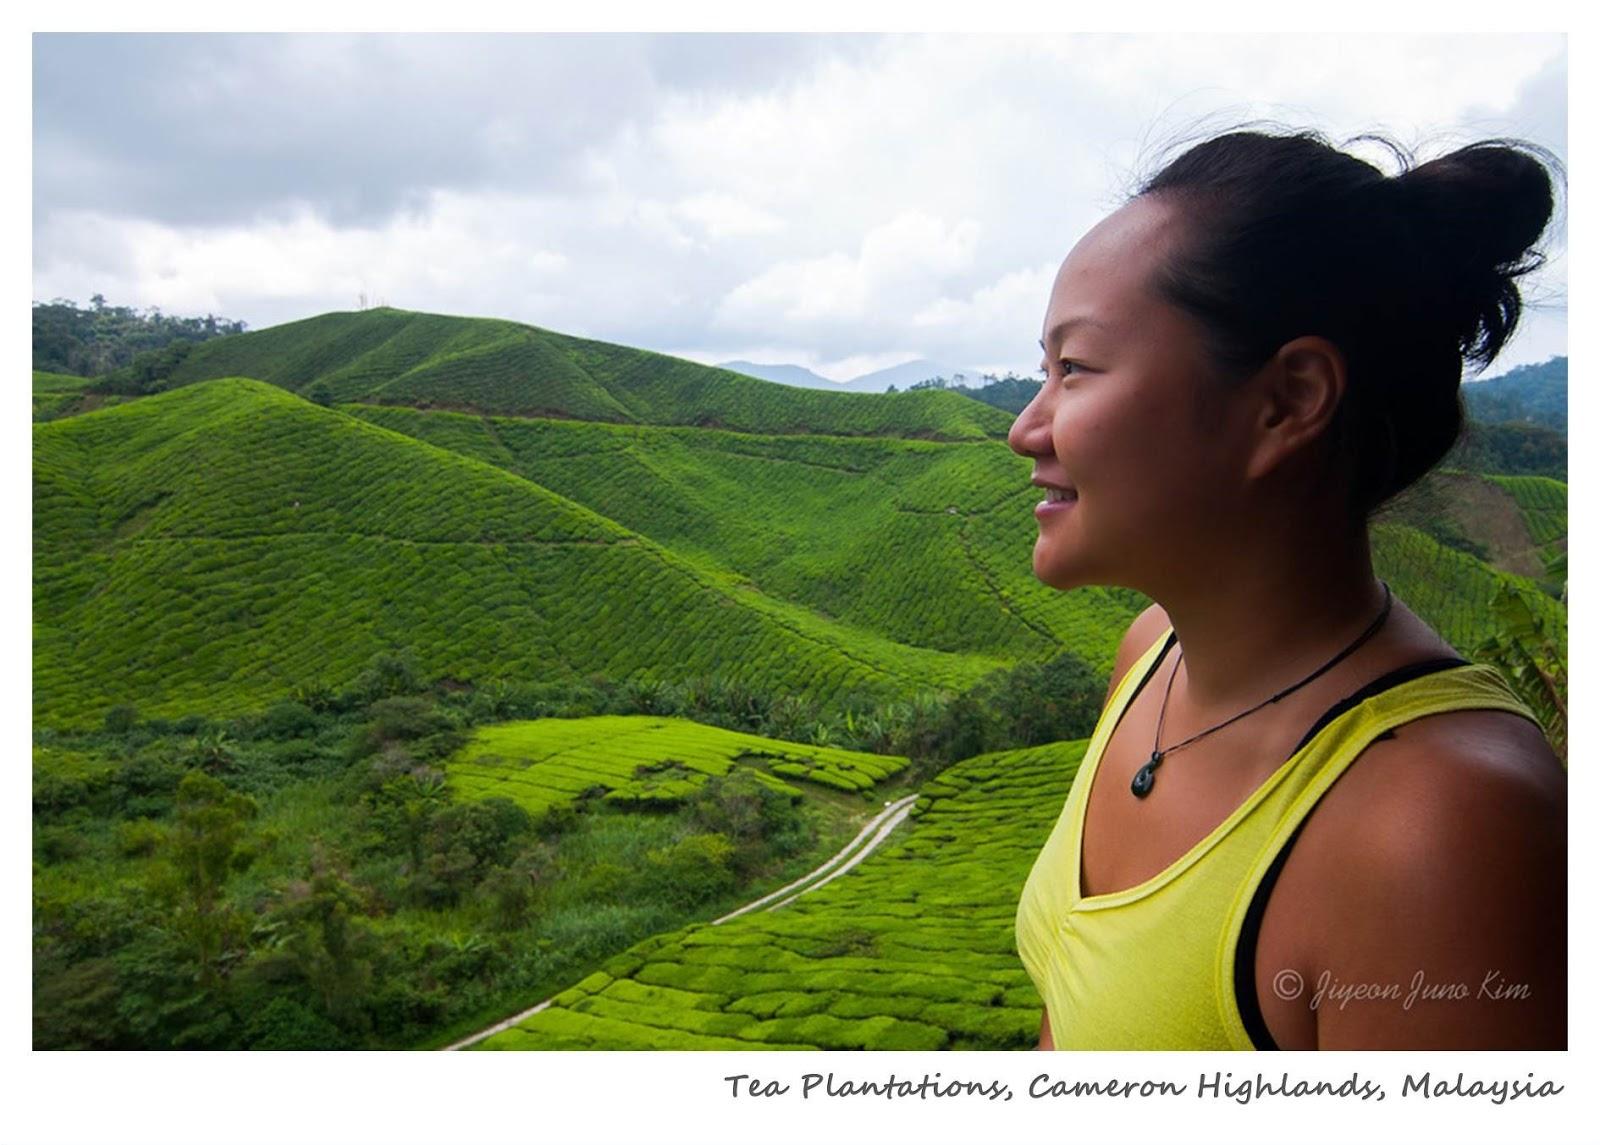 Tea Plantations in Cameron Highlands, Malaysia - www.runawayjuno.com www.rambleandwander.com